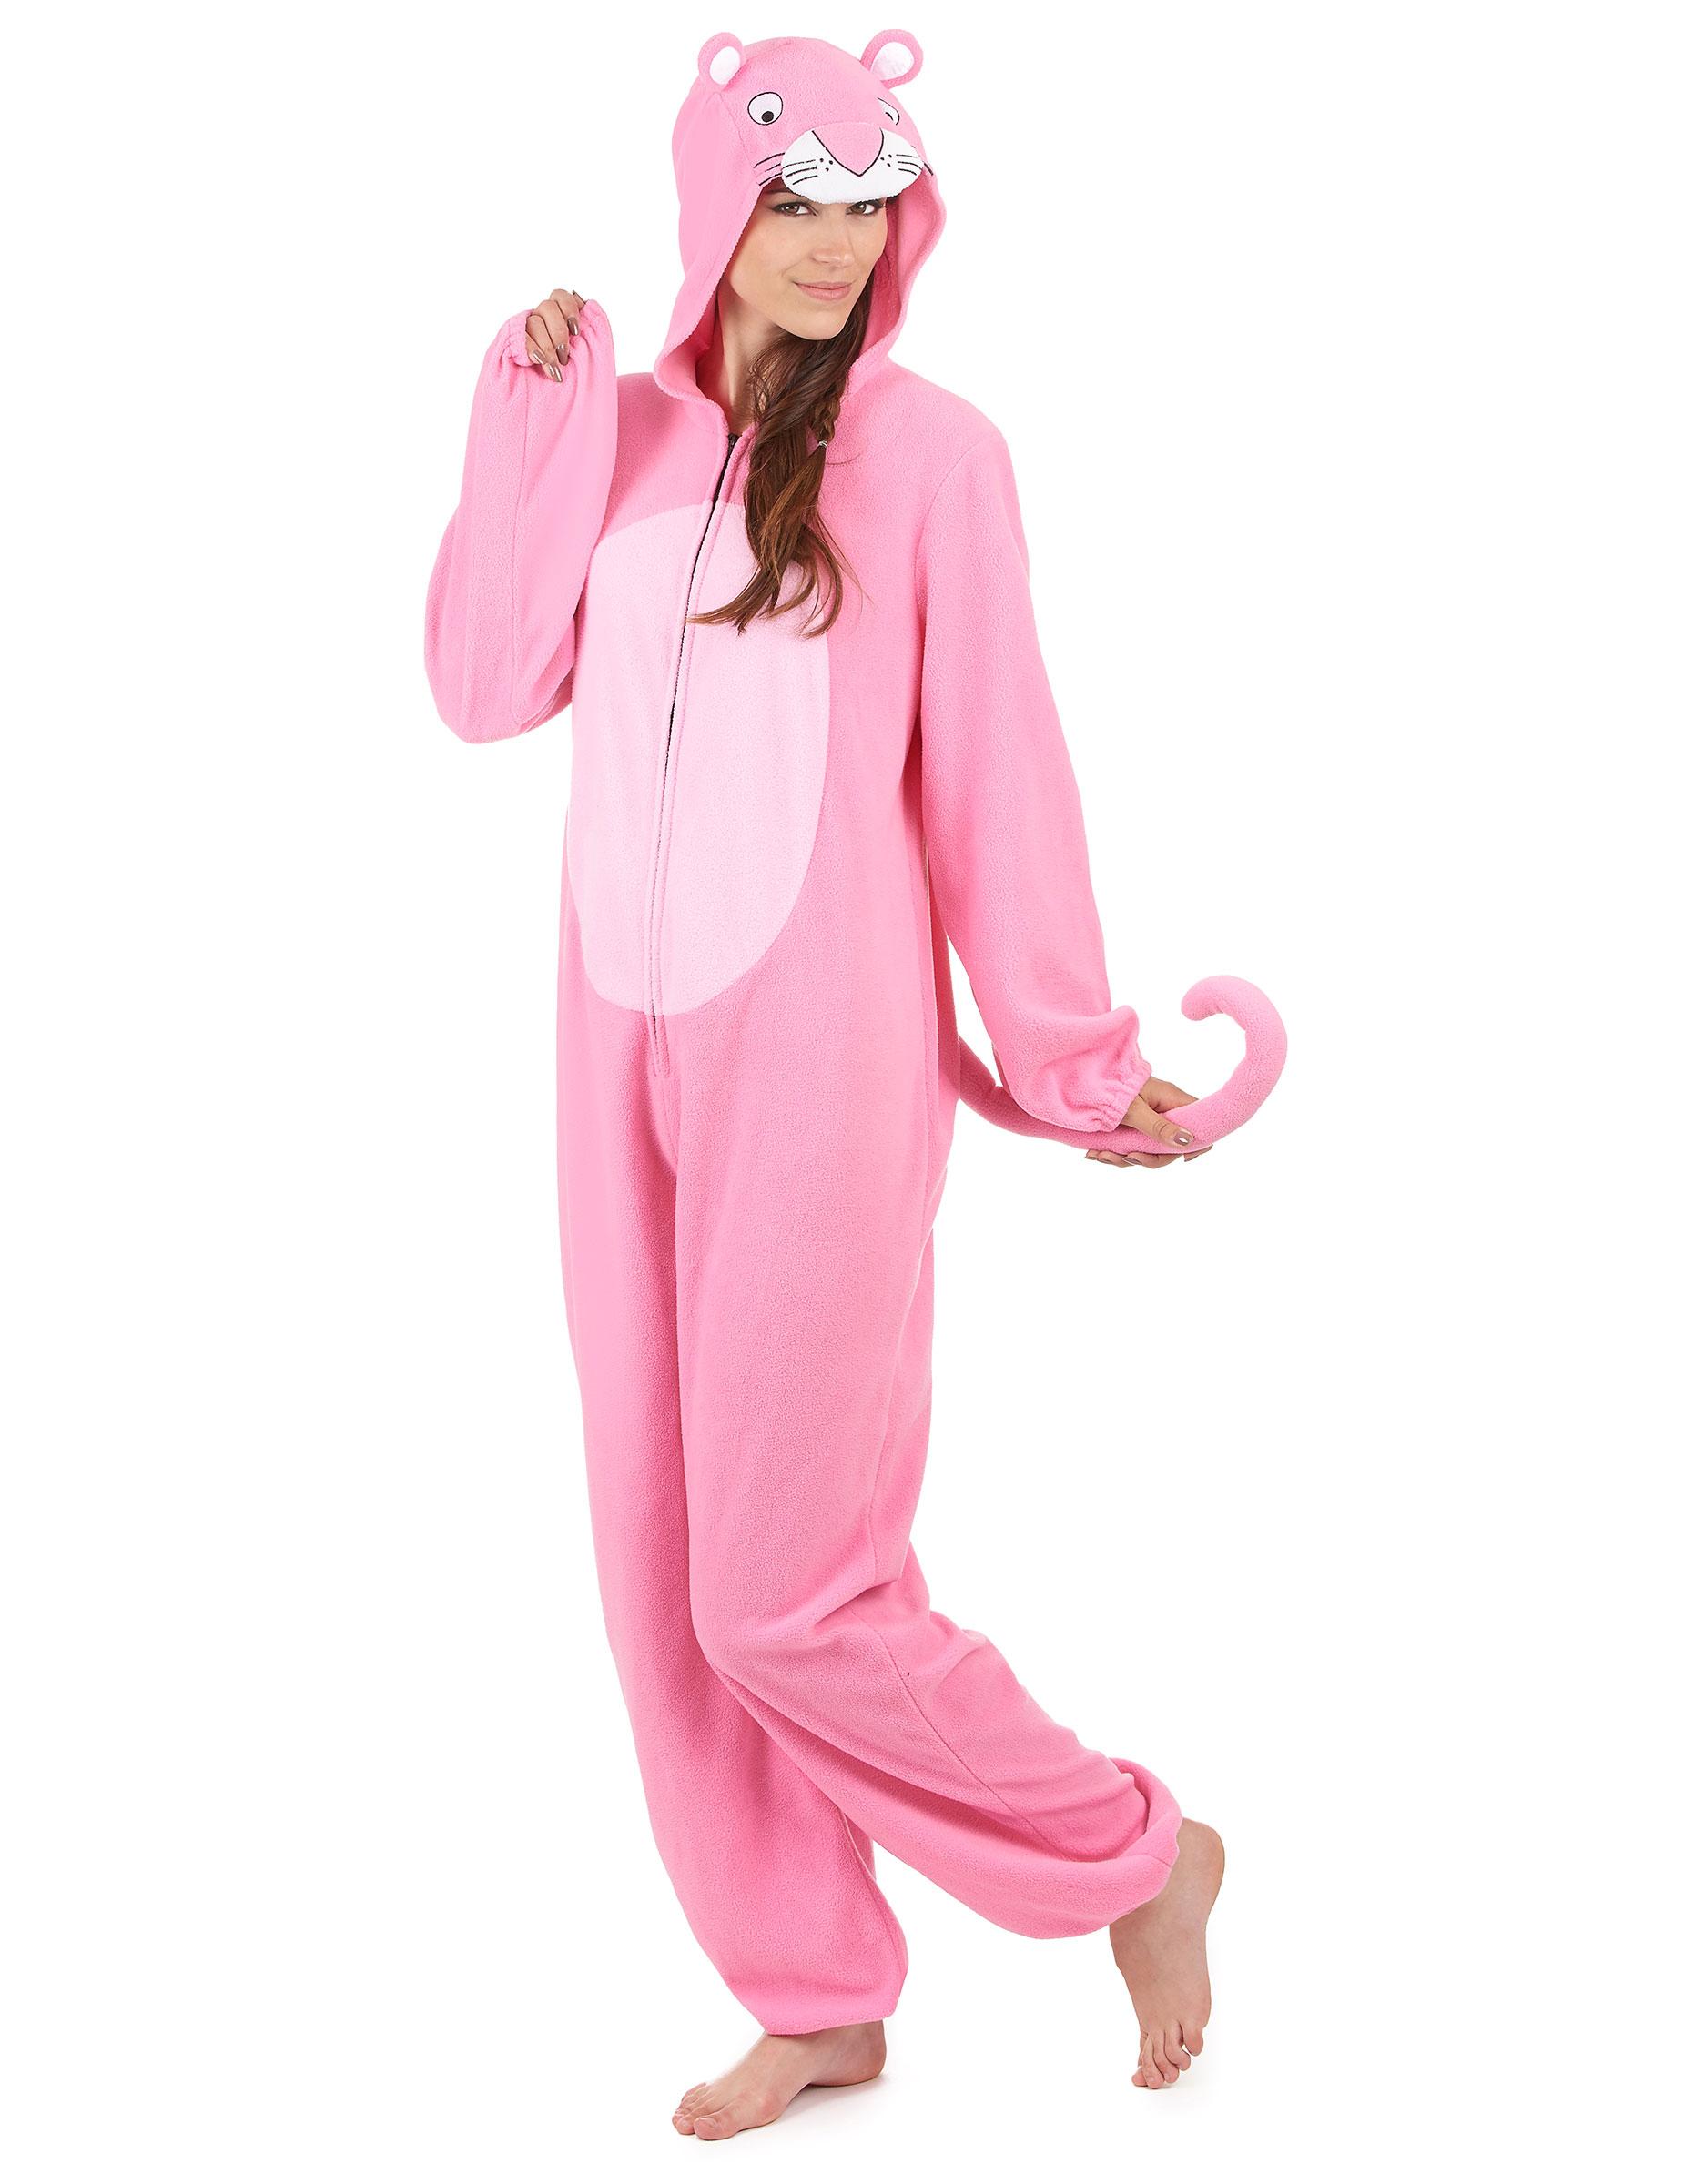 Panther Kostüm Für Für Damen Panther Panther Damen Rosa Rosa Kostüm Rosa qCxw4Bp